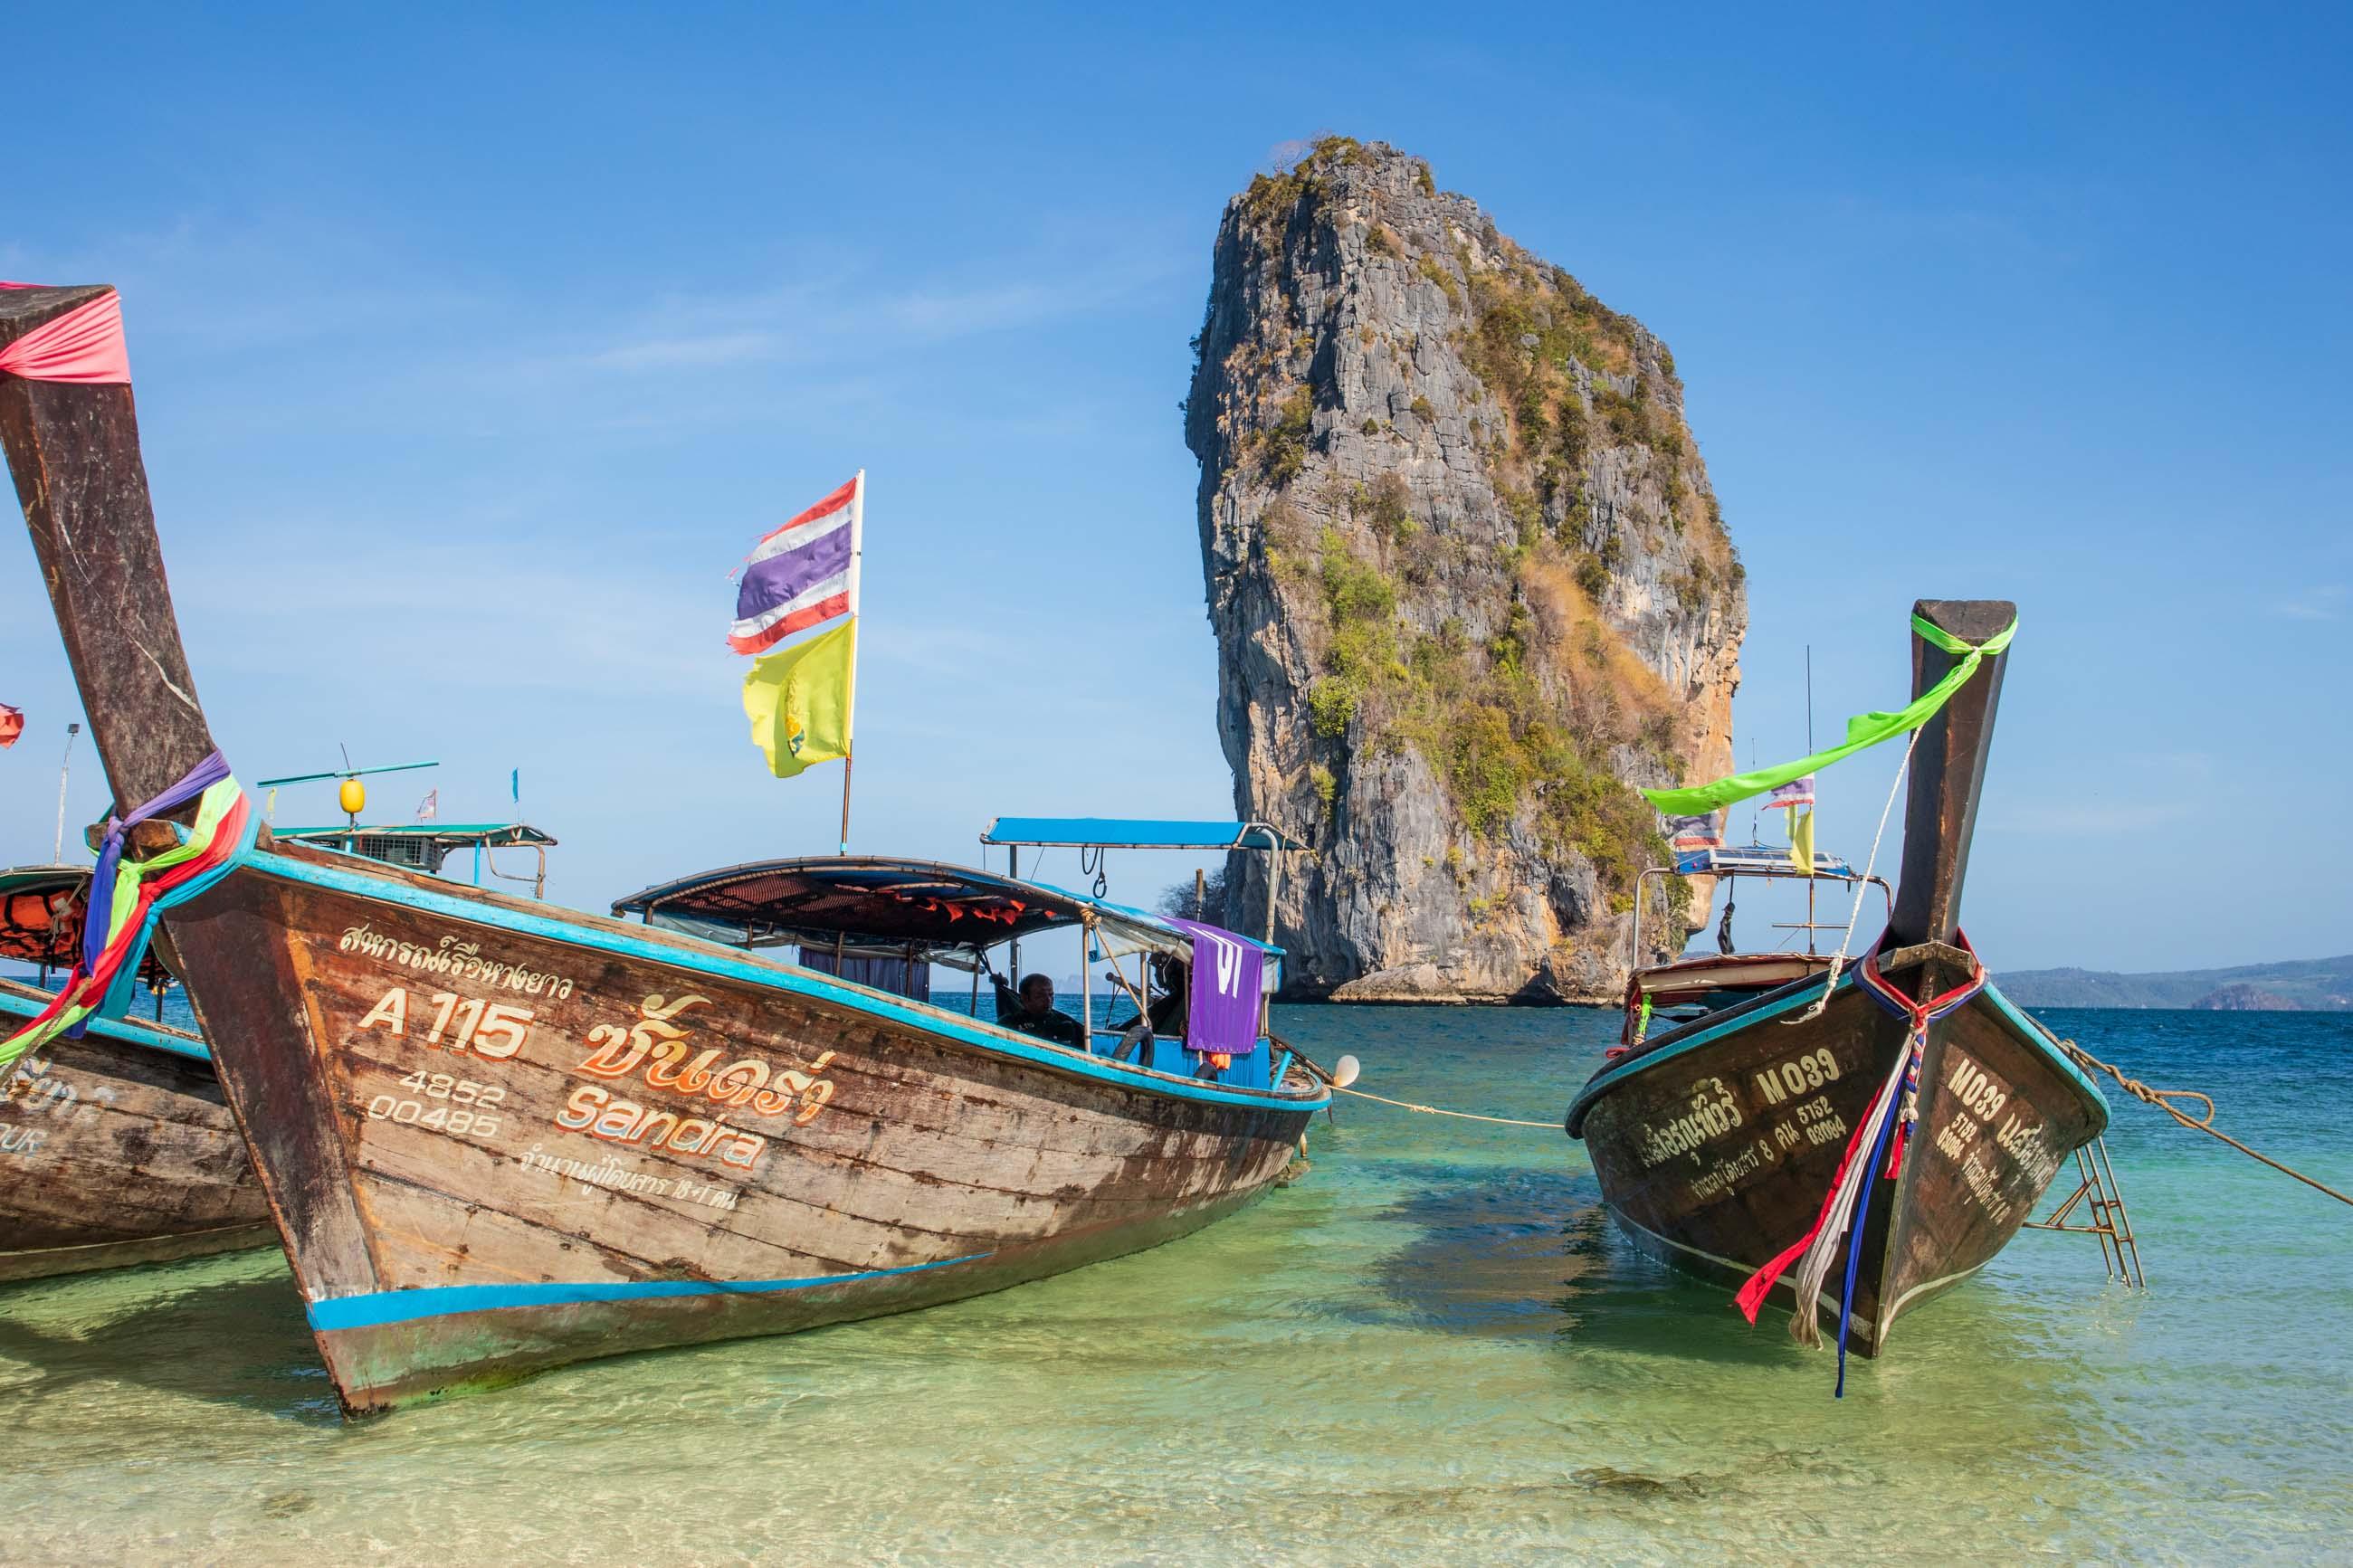 https://bubo.sk/uploads/galleries/5062/tomashornak_thajsko_img_0014.jpg